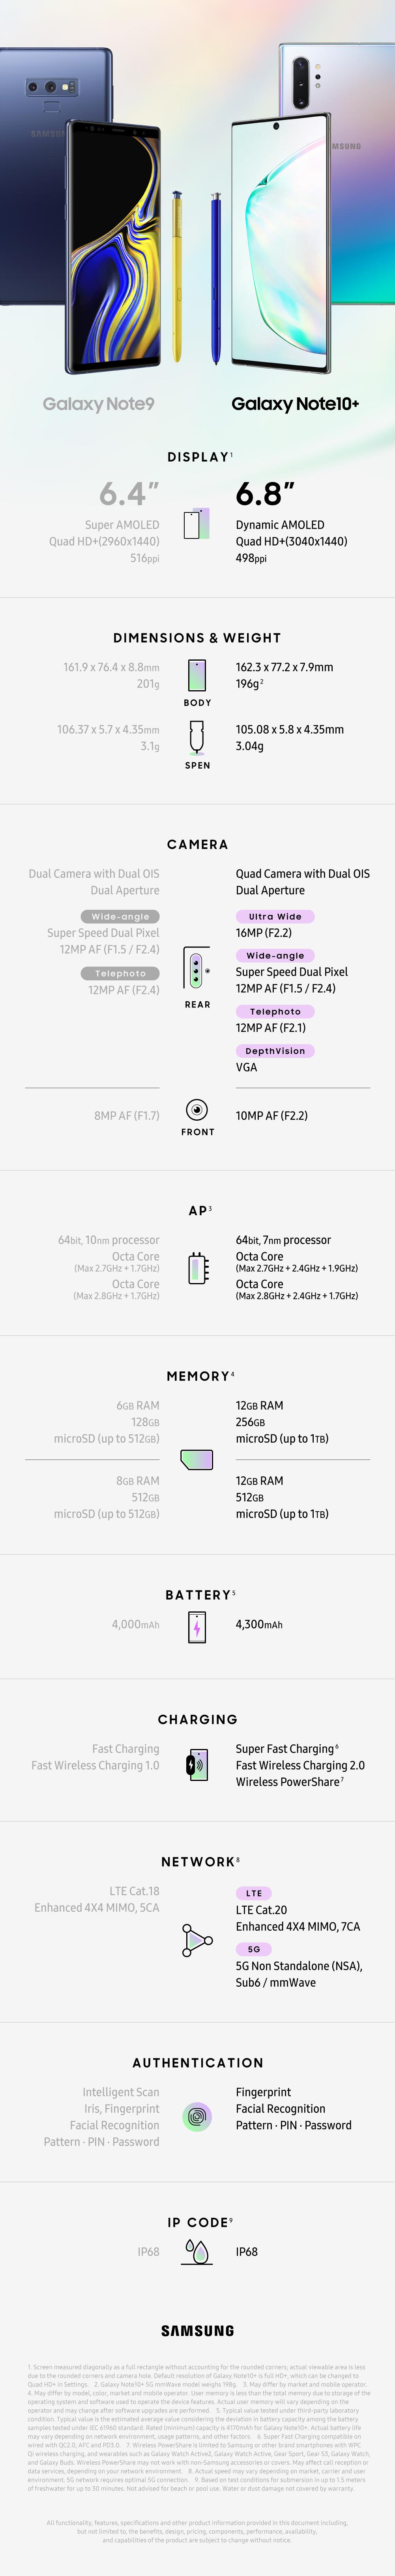 Infographic_Galaxy-Note10-Galaxy-Note9-Spec-Comparison